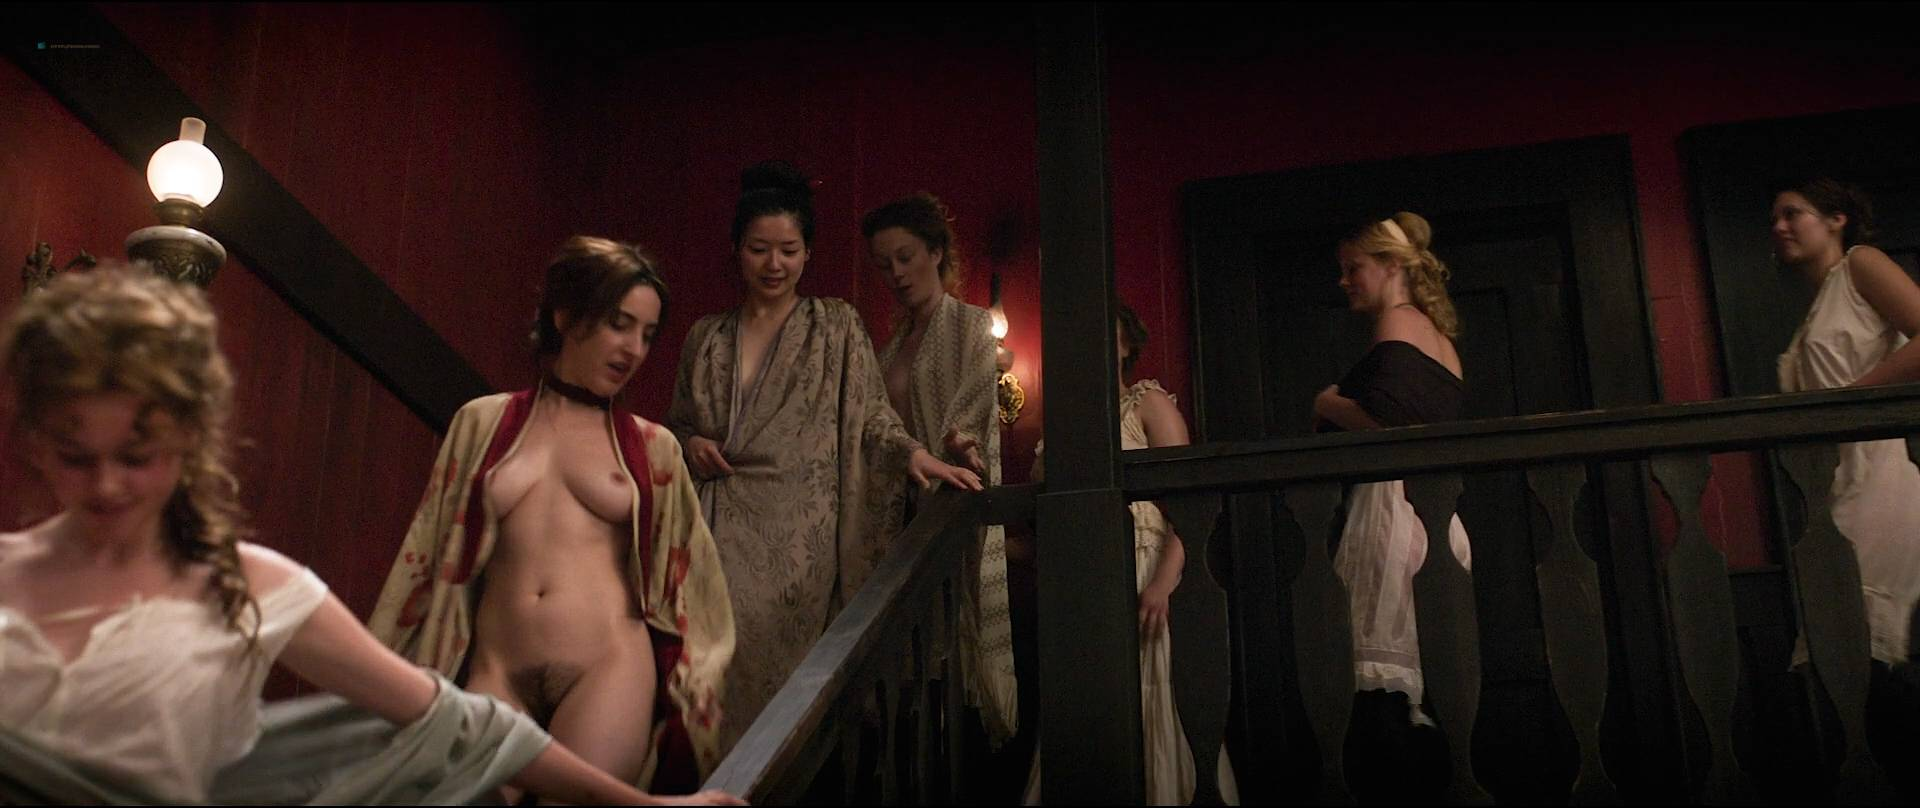 Dakota Fanning hot, Carla Juri, Vera Vitali others nude bush - Brimstone (2016) HD 1080p BluRay (13)